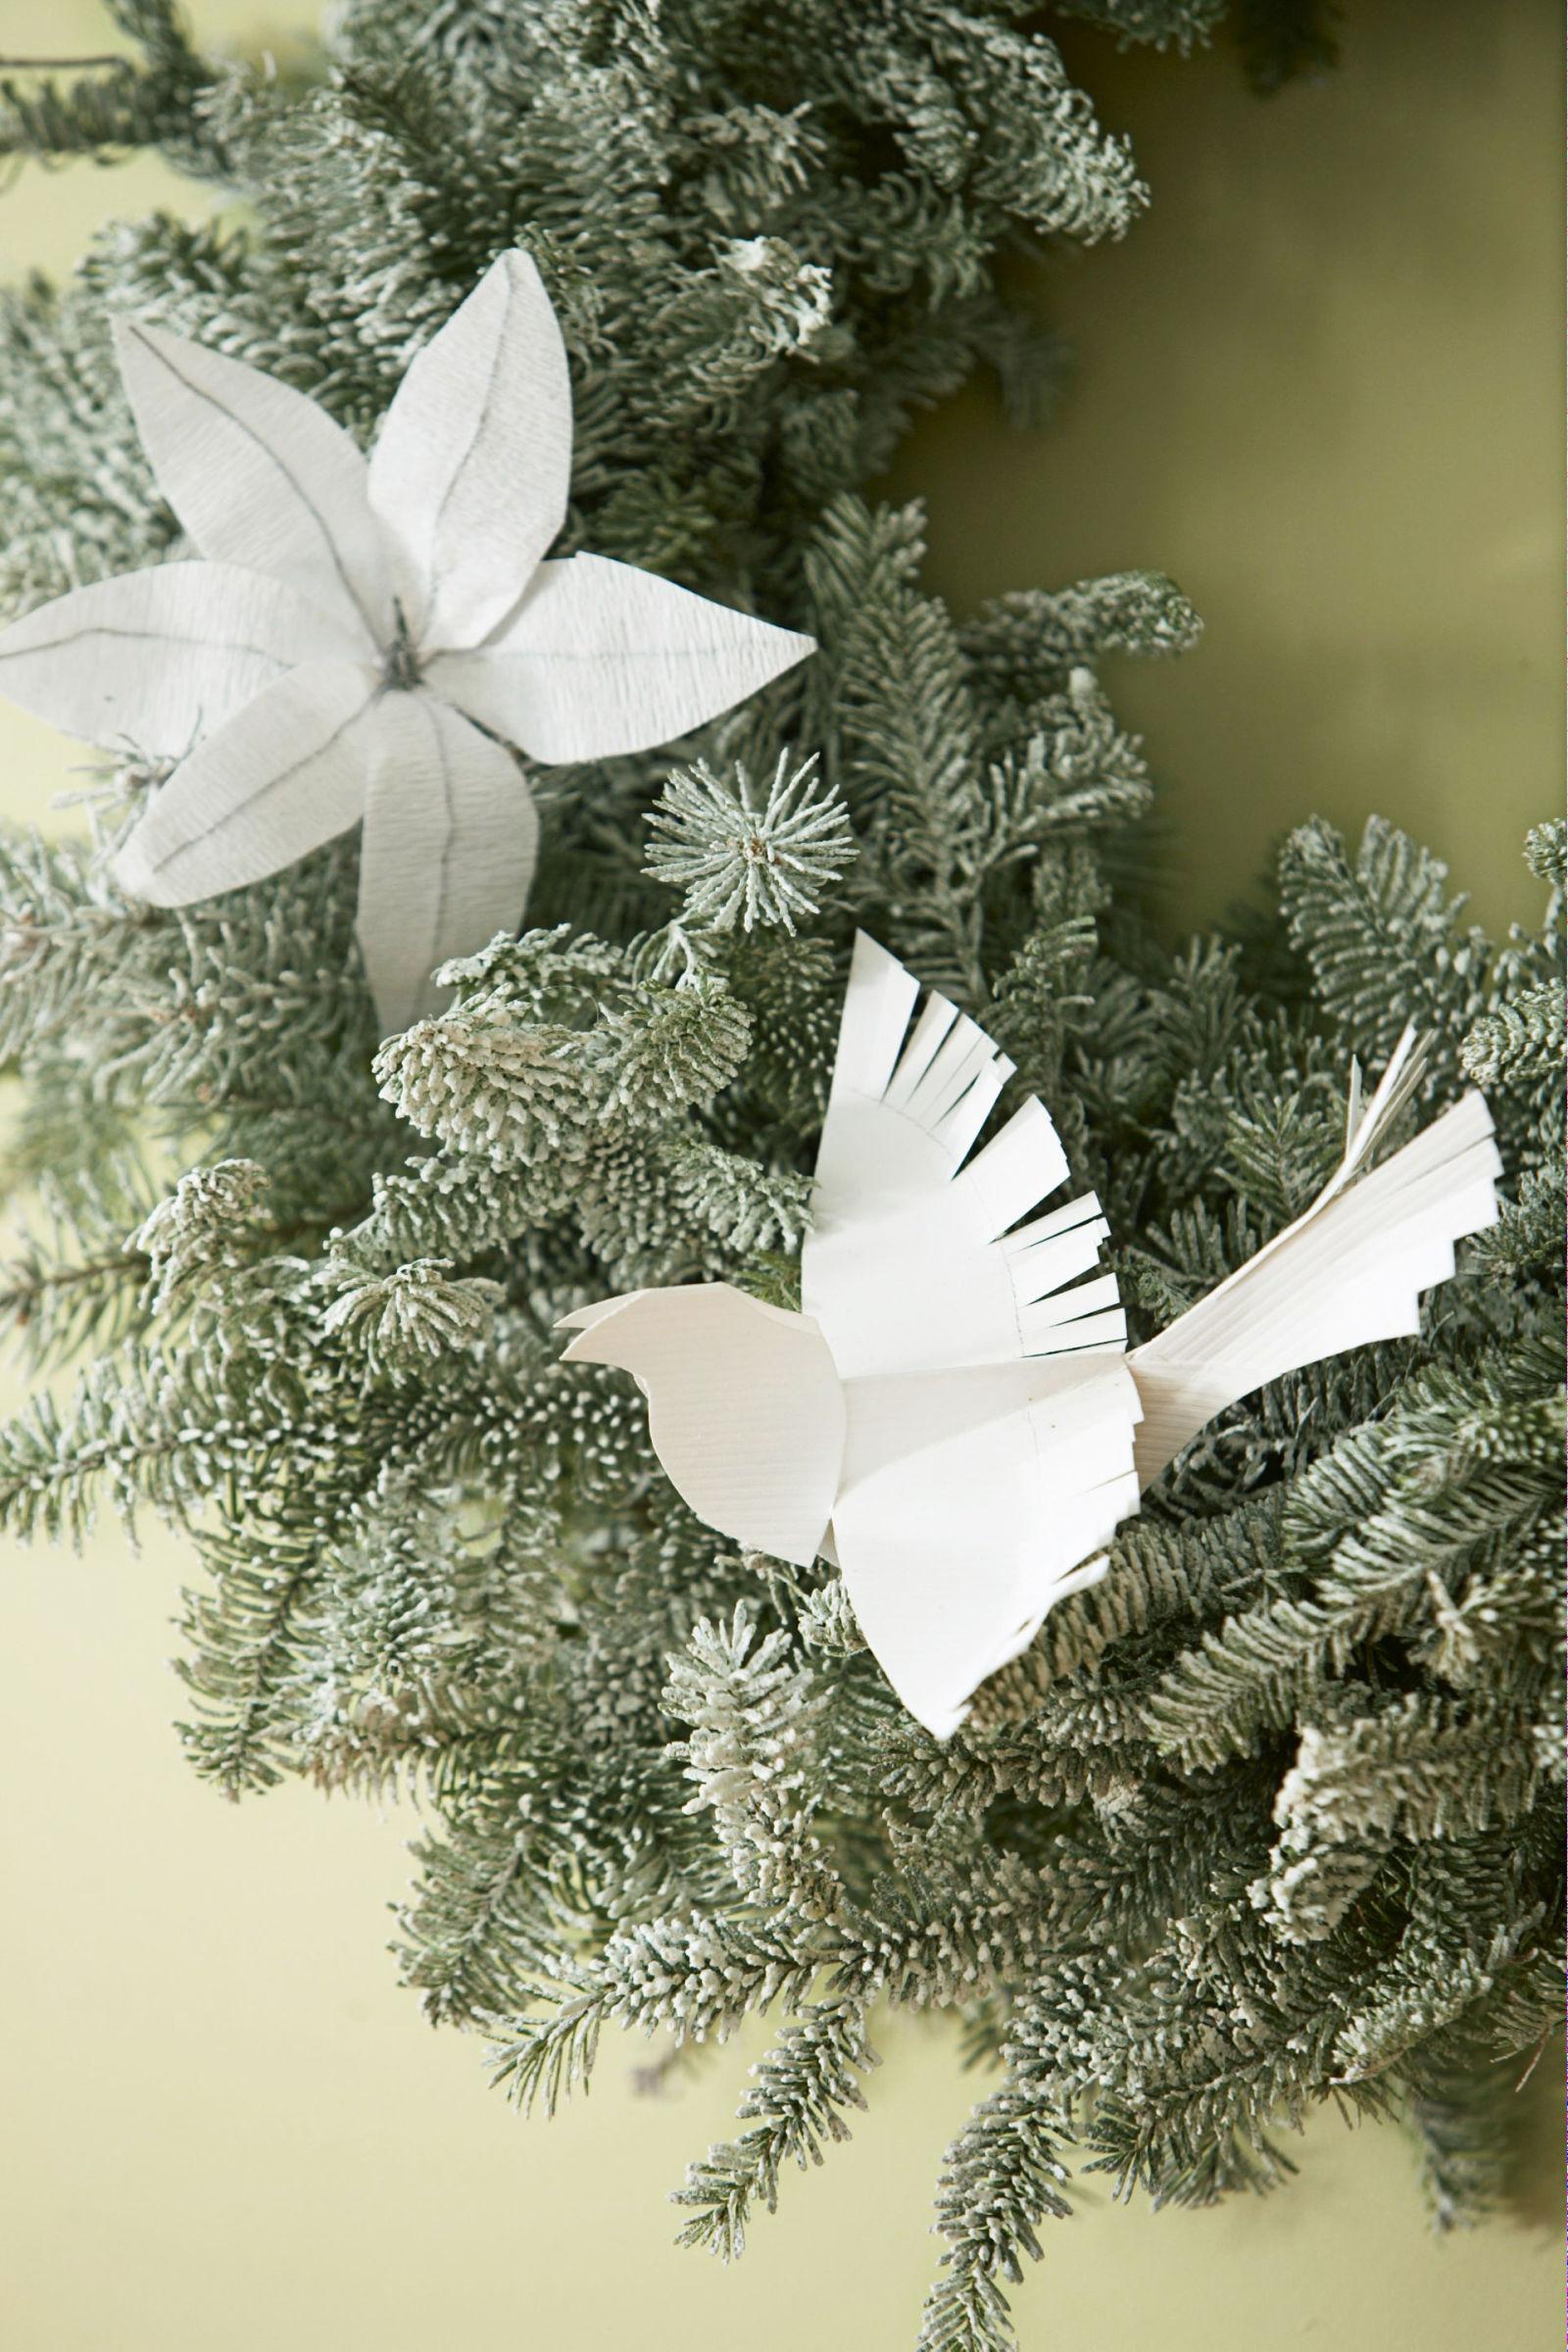 27 Easy Homemade Christmas Ornaments - How To Make DIY ...